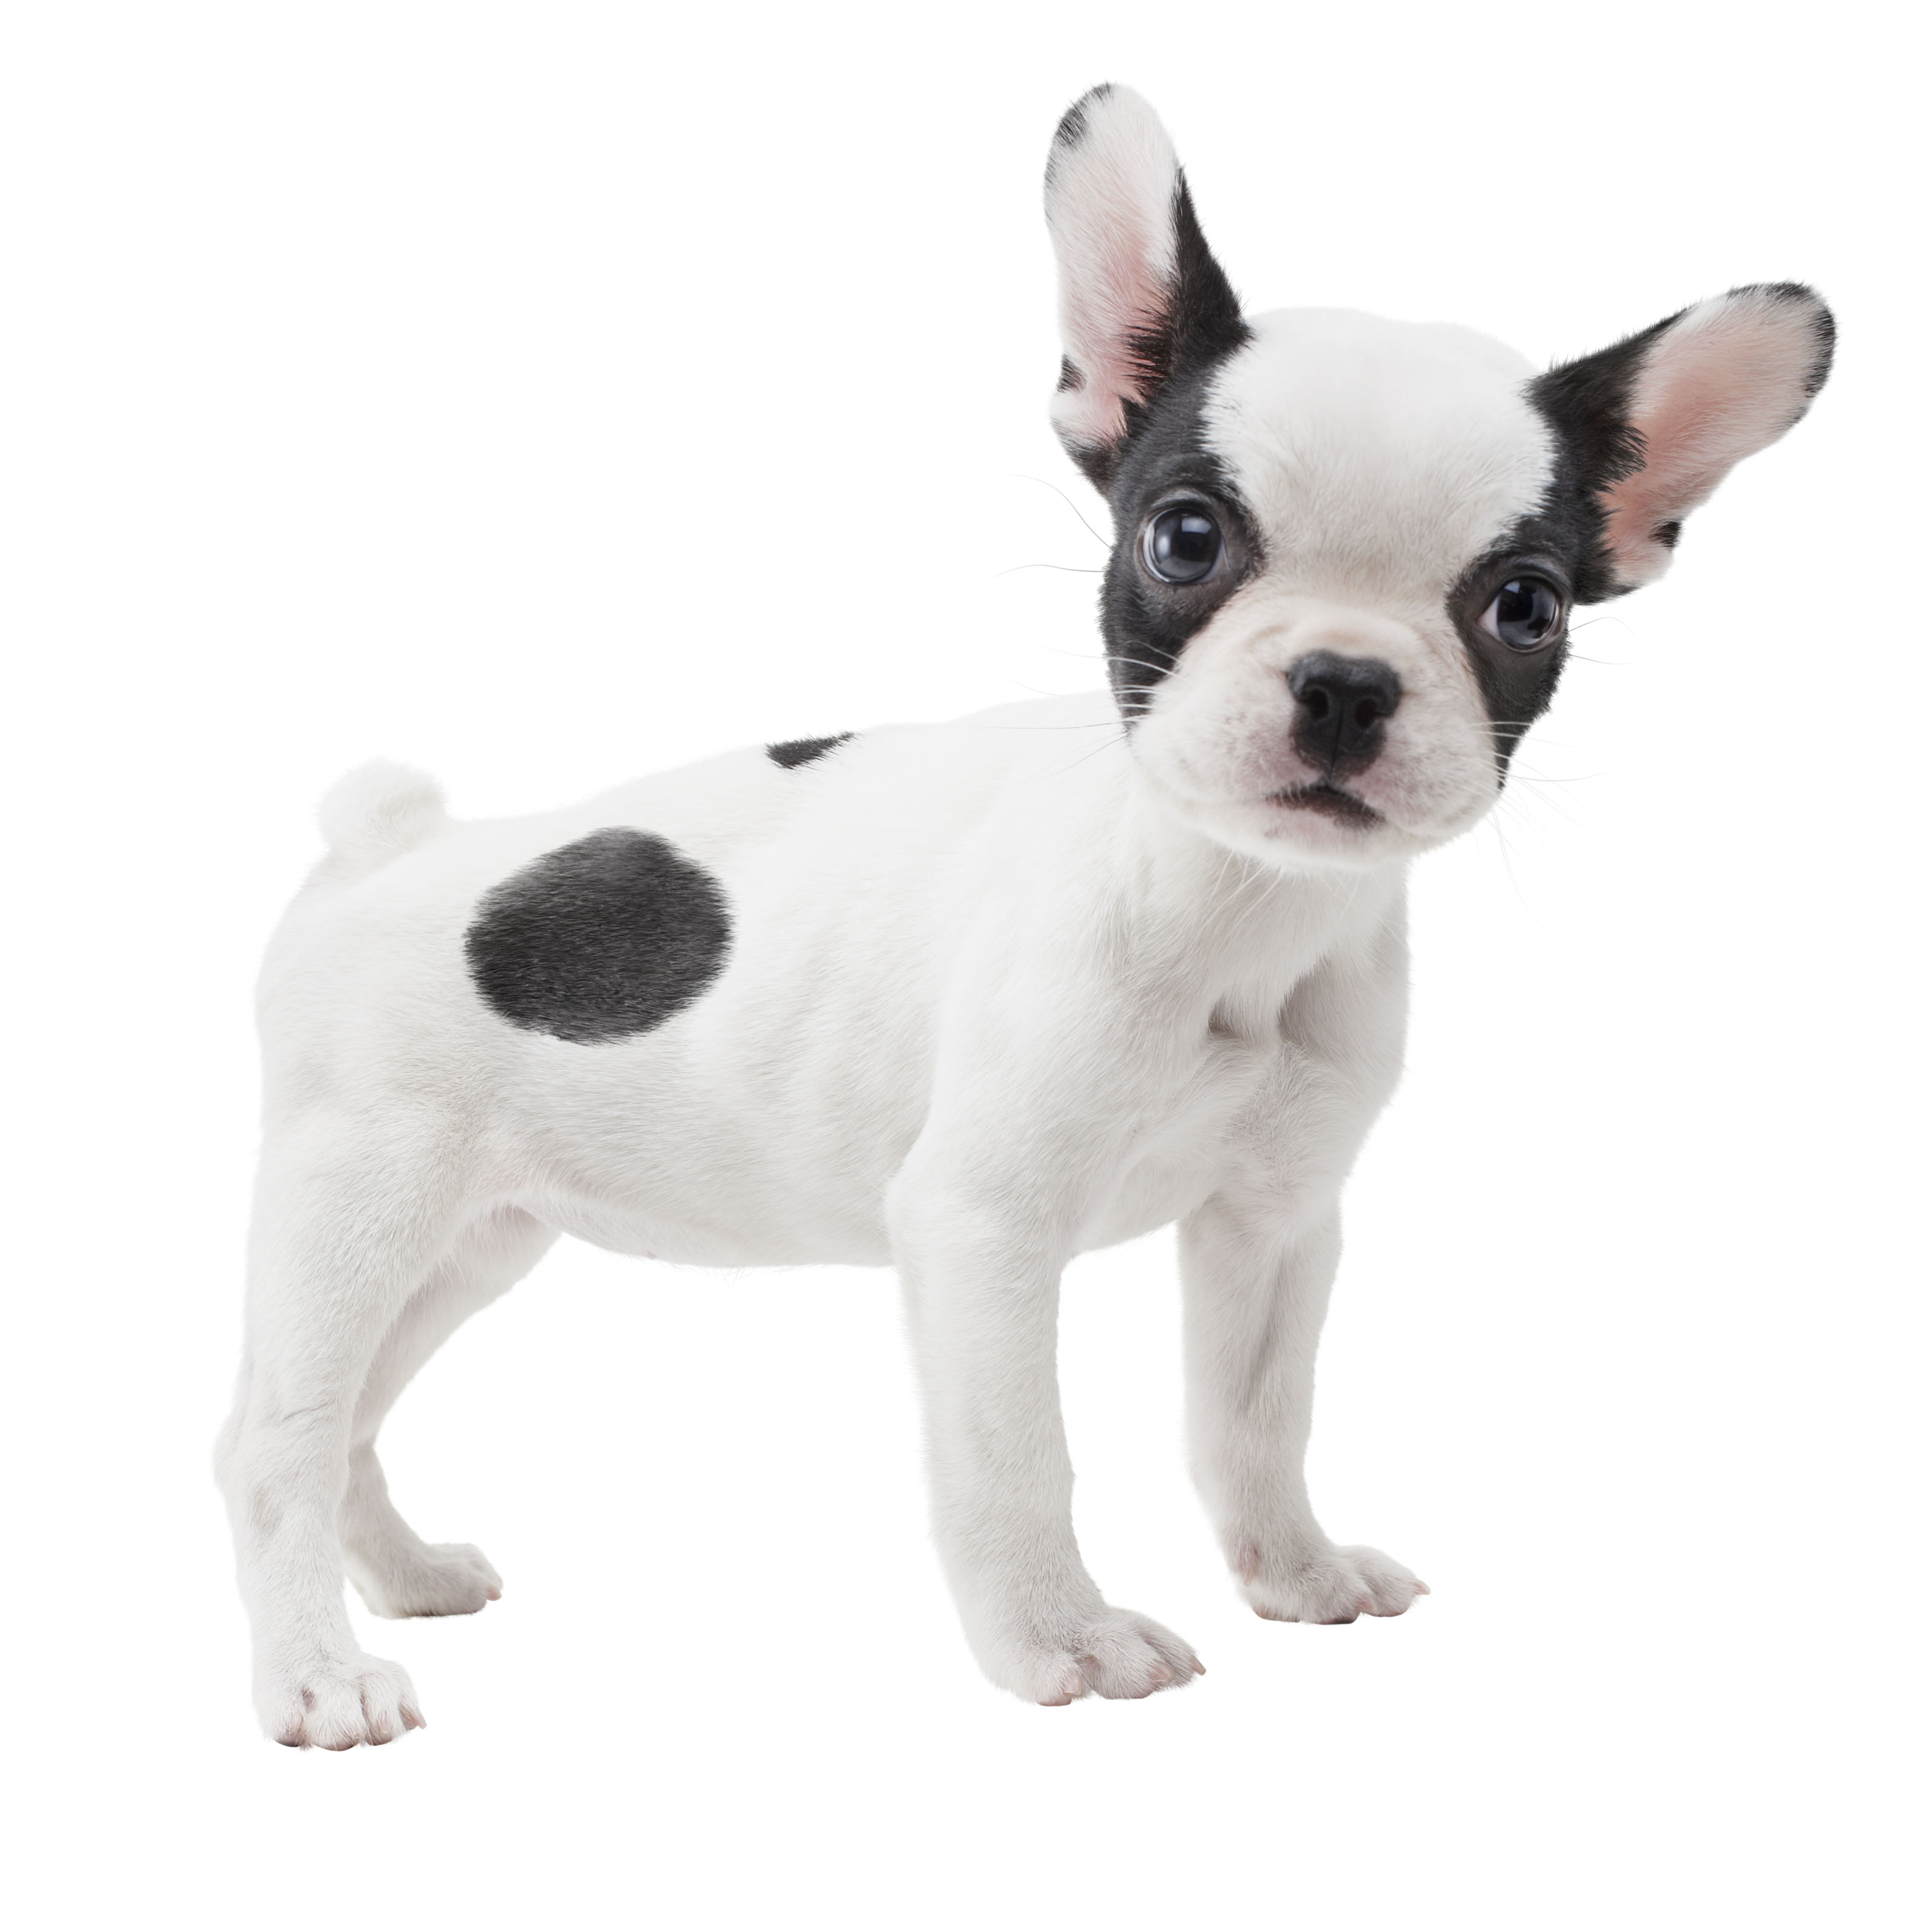 Small Dog Large Ears Pug Face